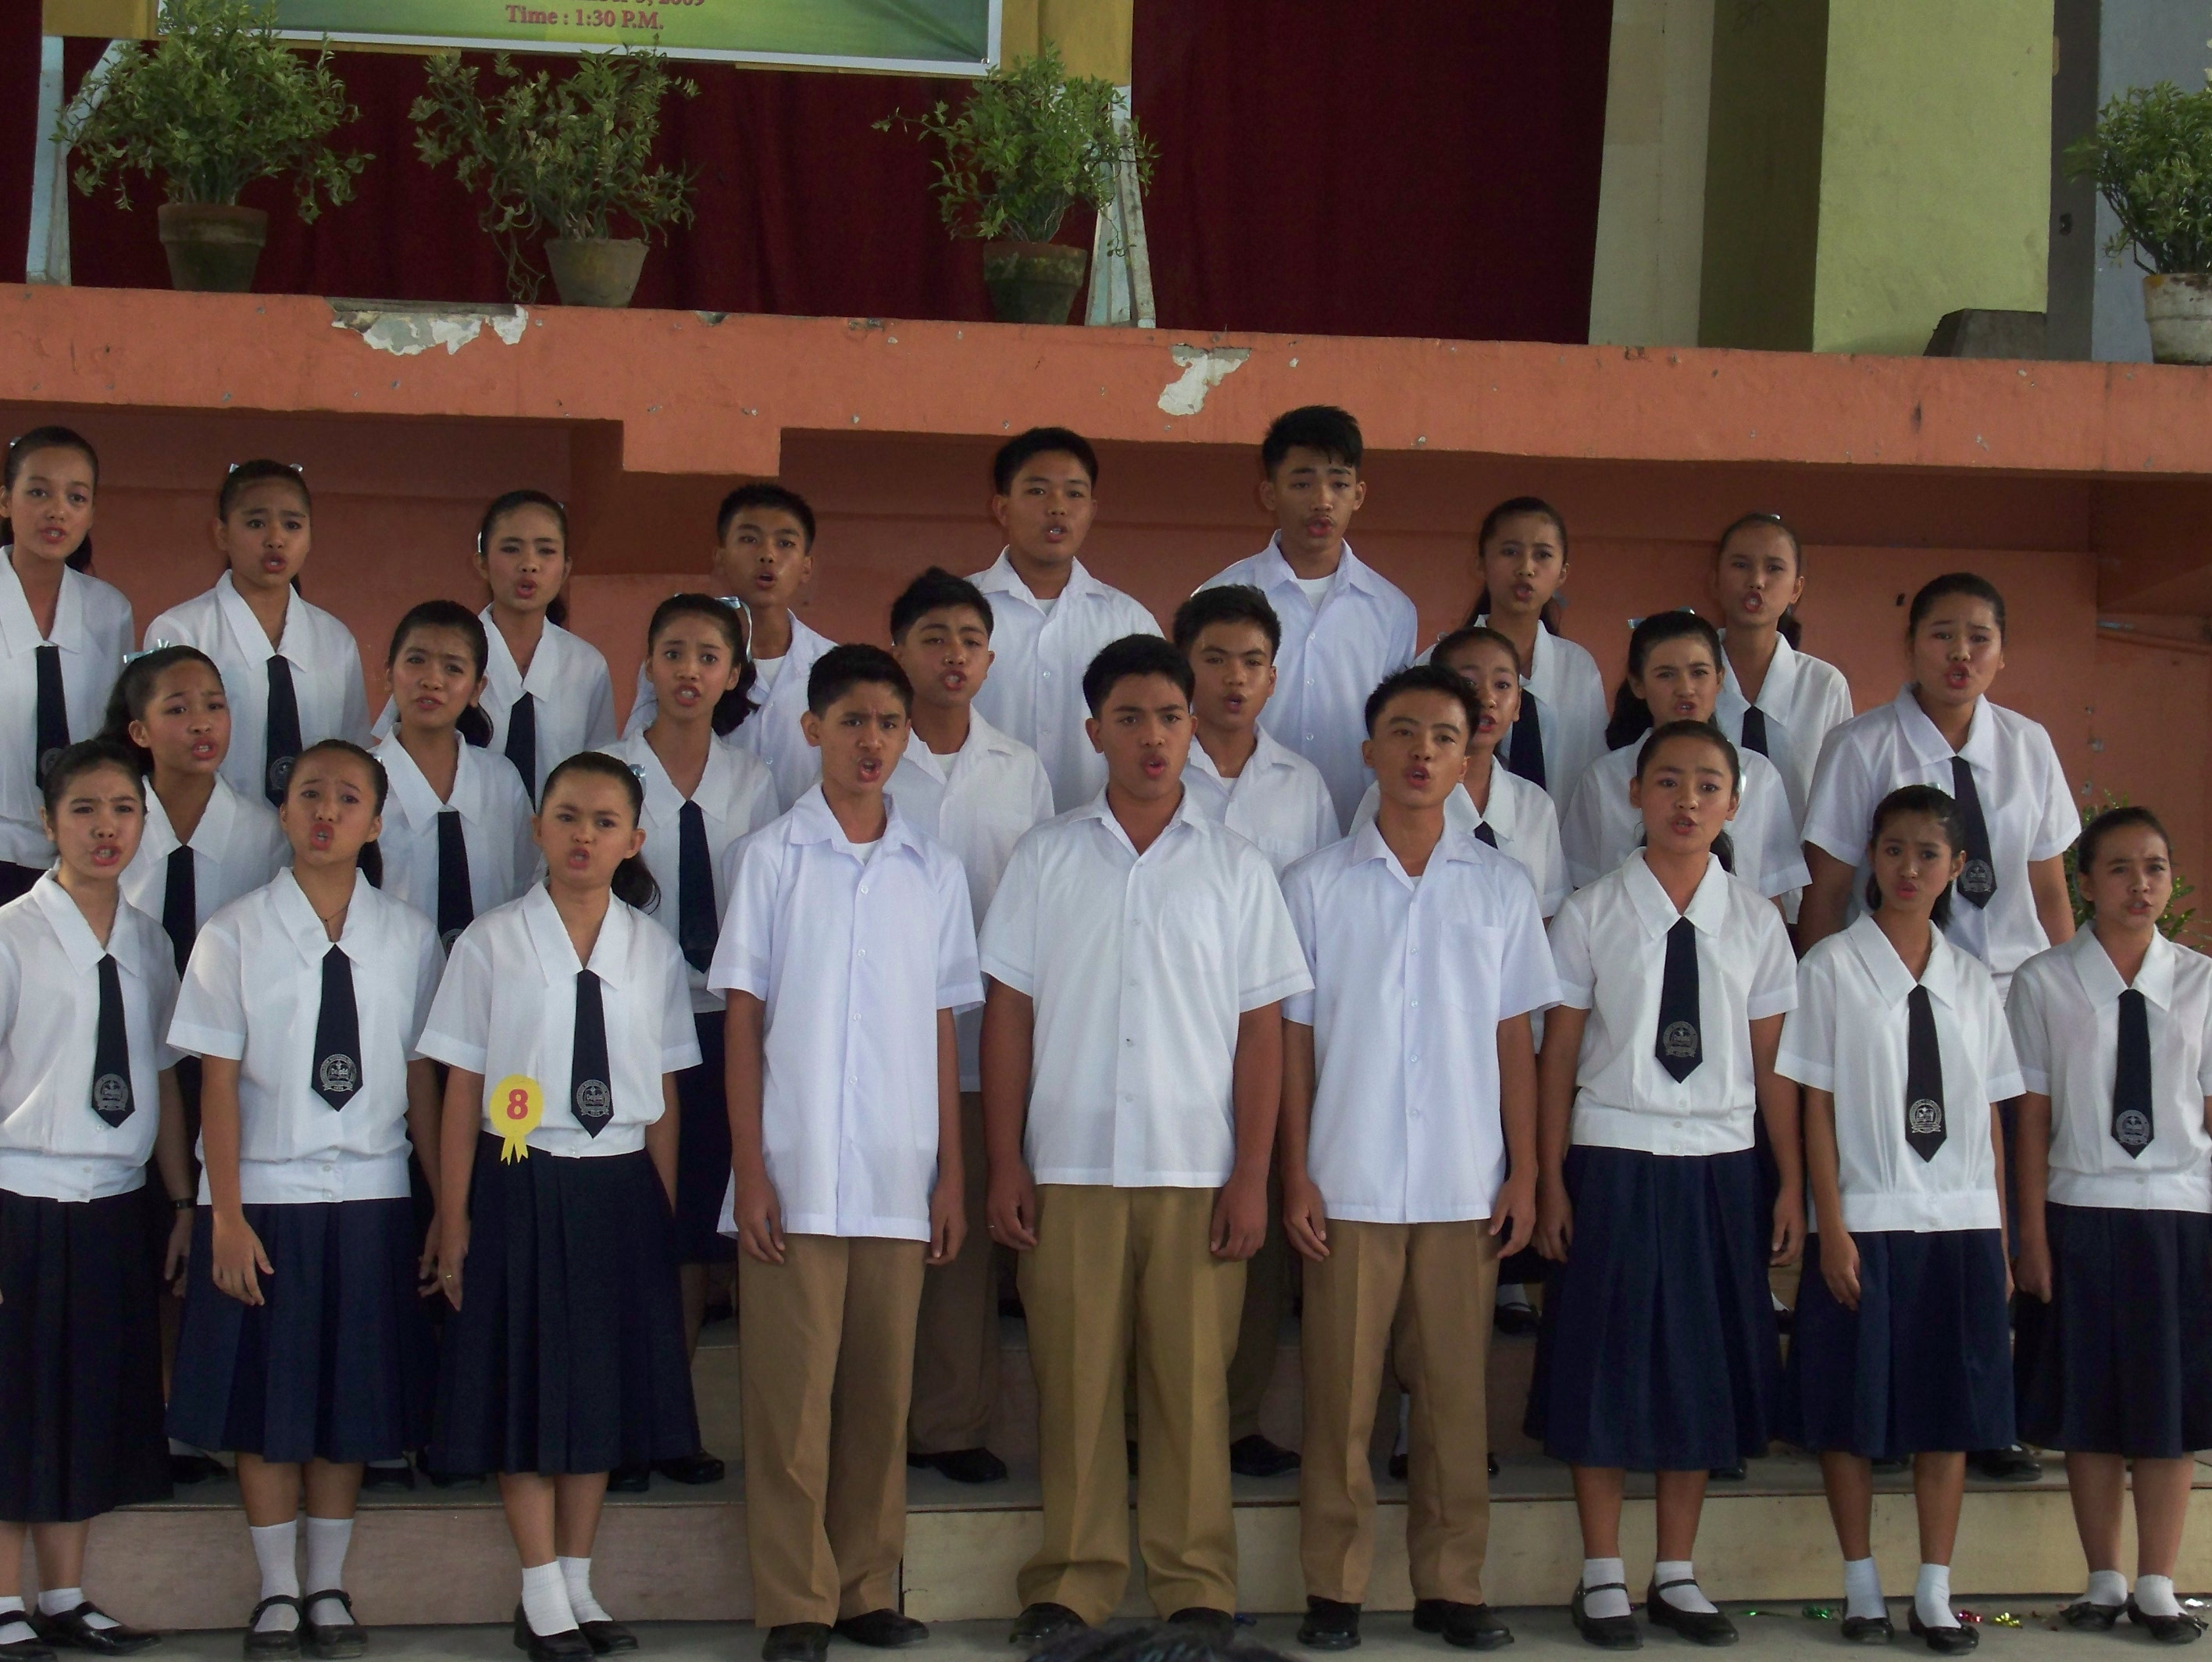 the choir speech over or choir choir dcae the choral